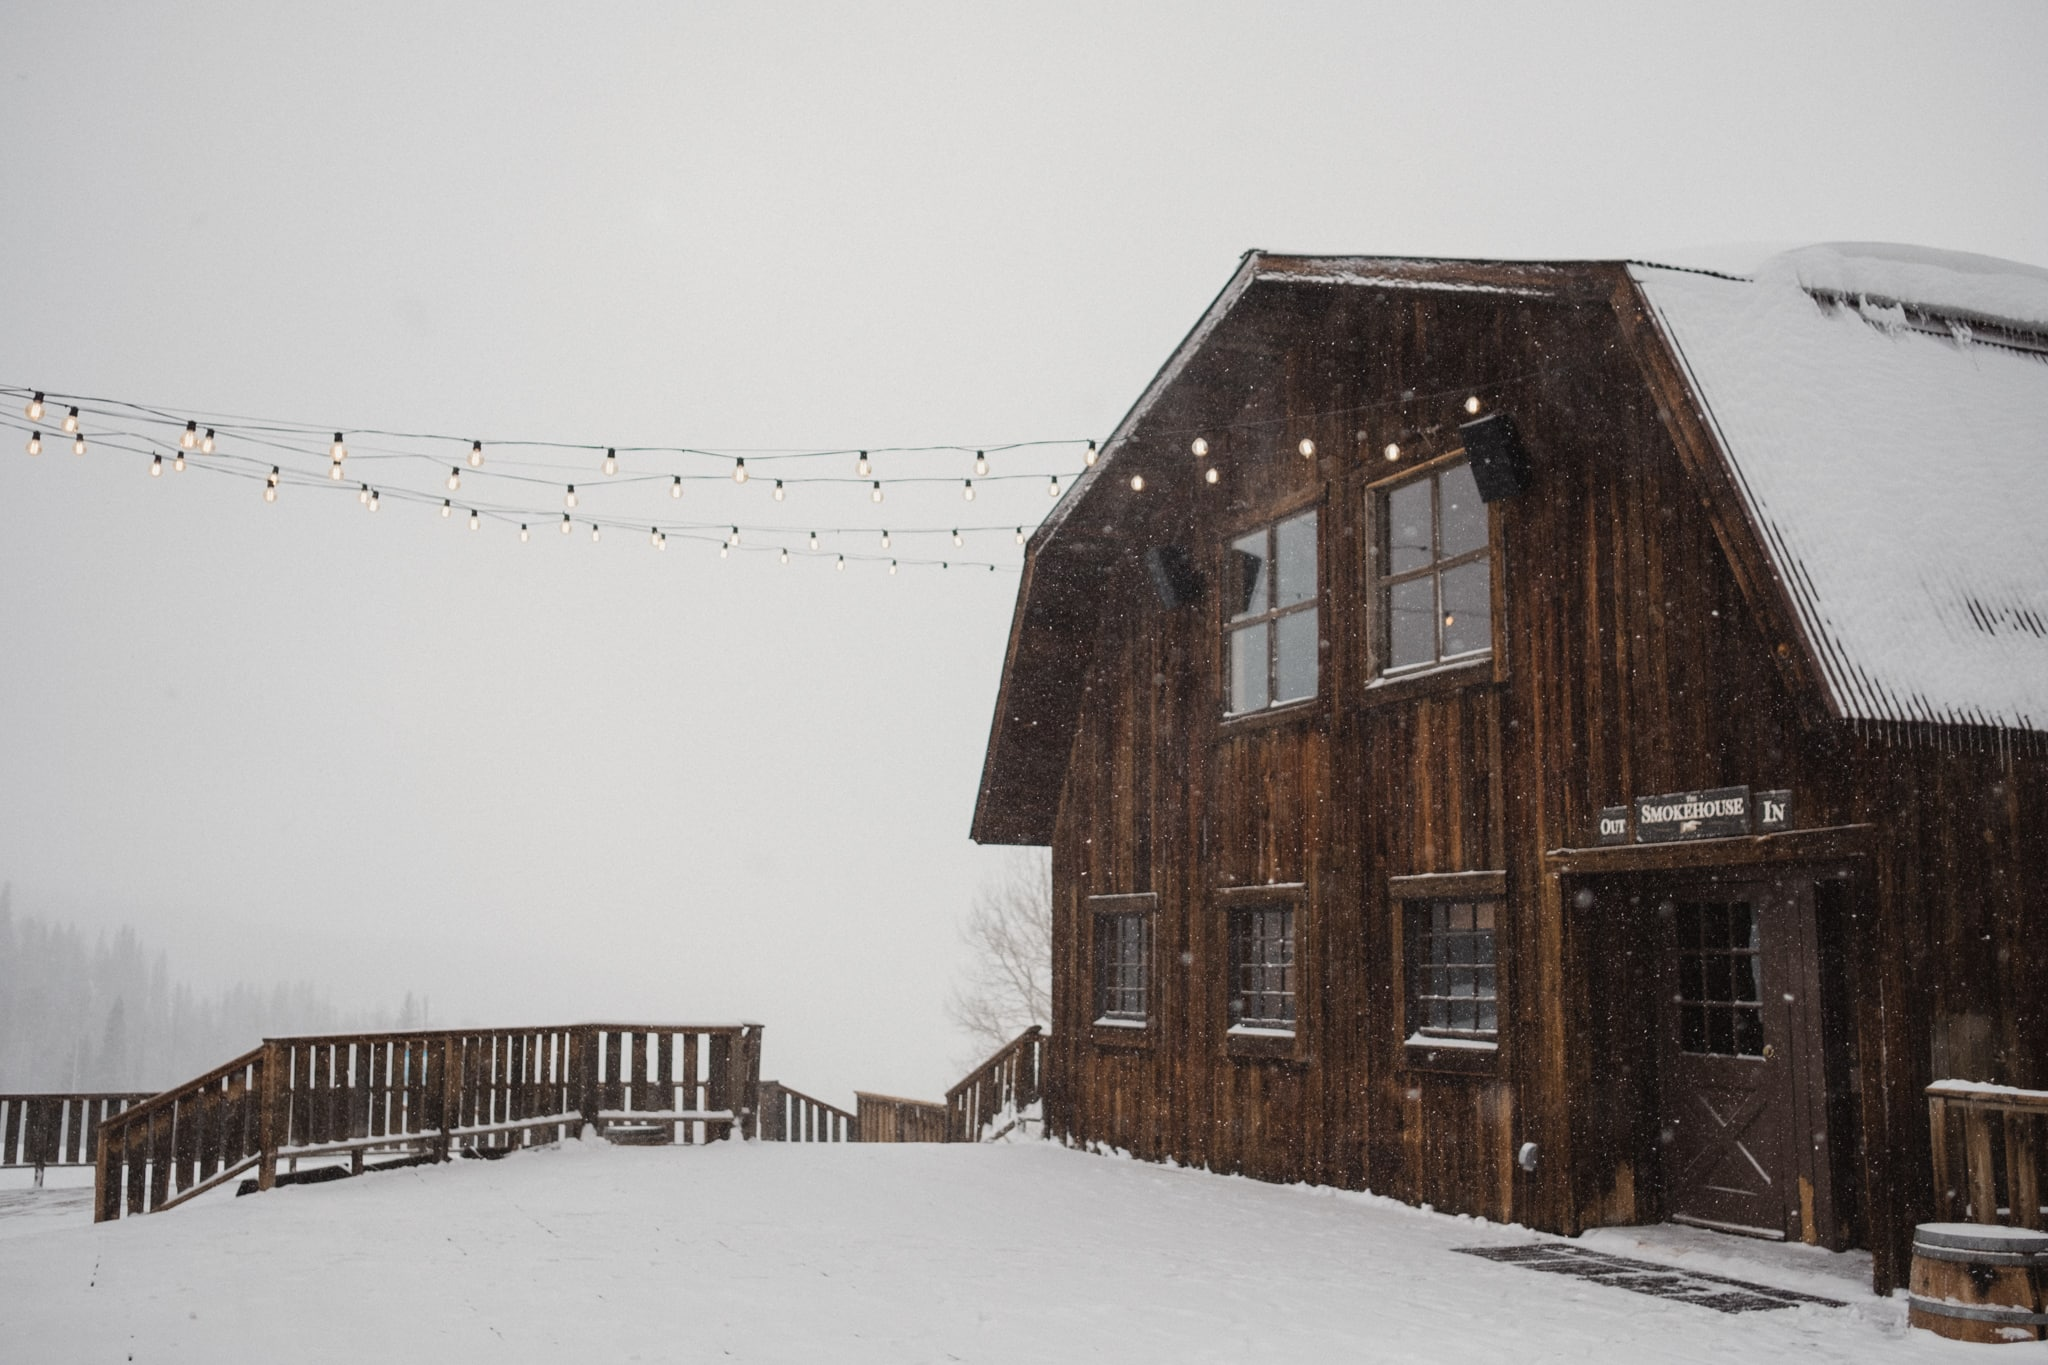 Gorrono Ranch winter wedding, Telluride wedding photographer, Colorado winter wedding photographer, winter wedding venue, ski resort wedding